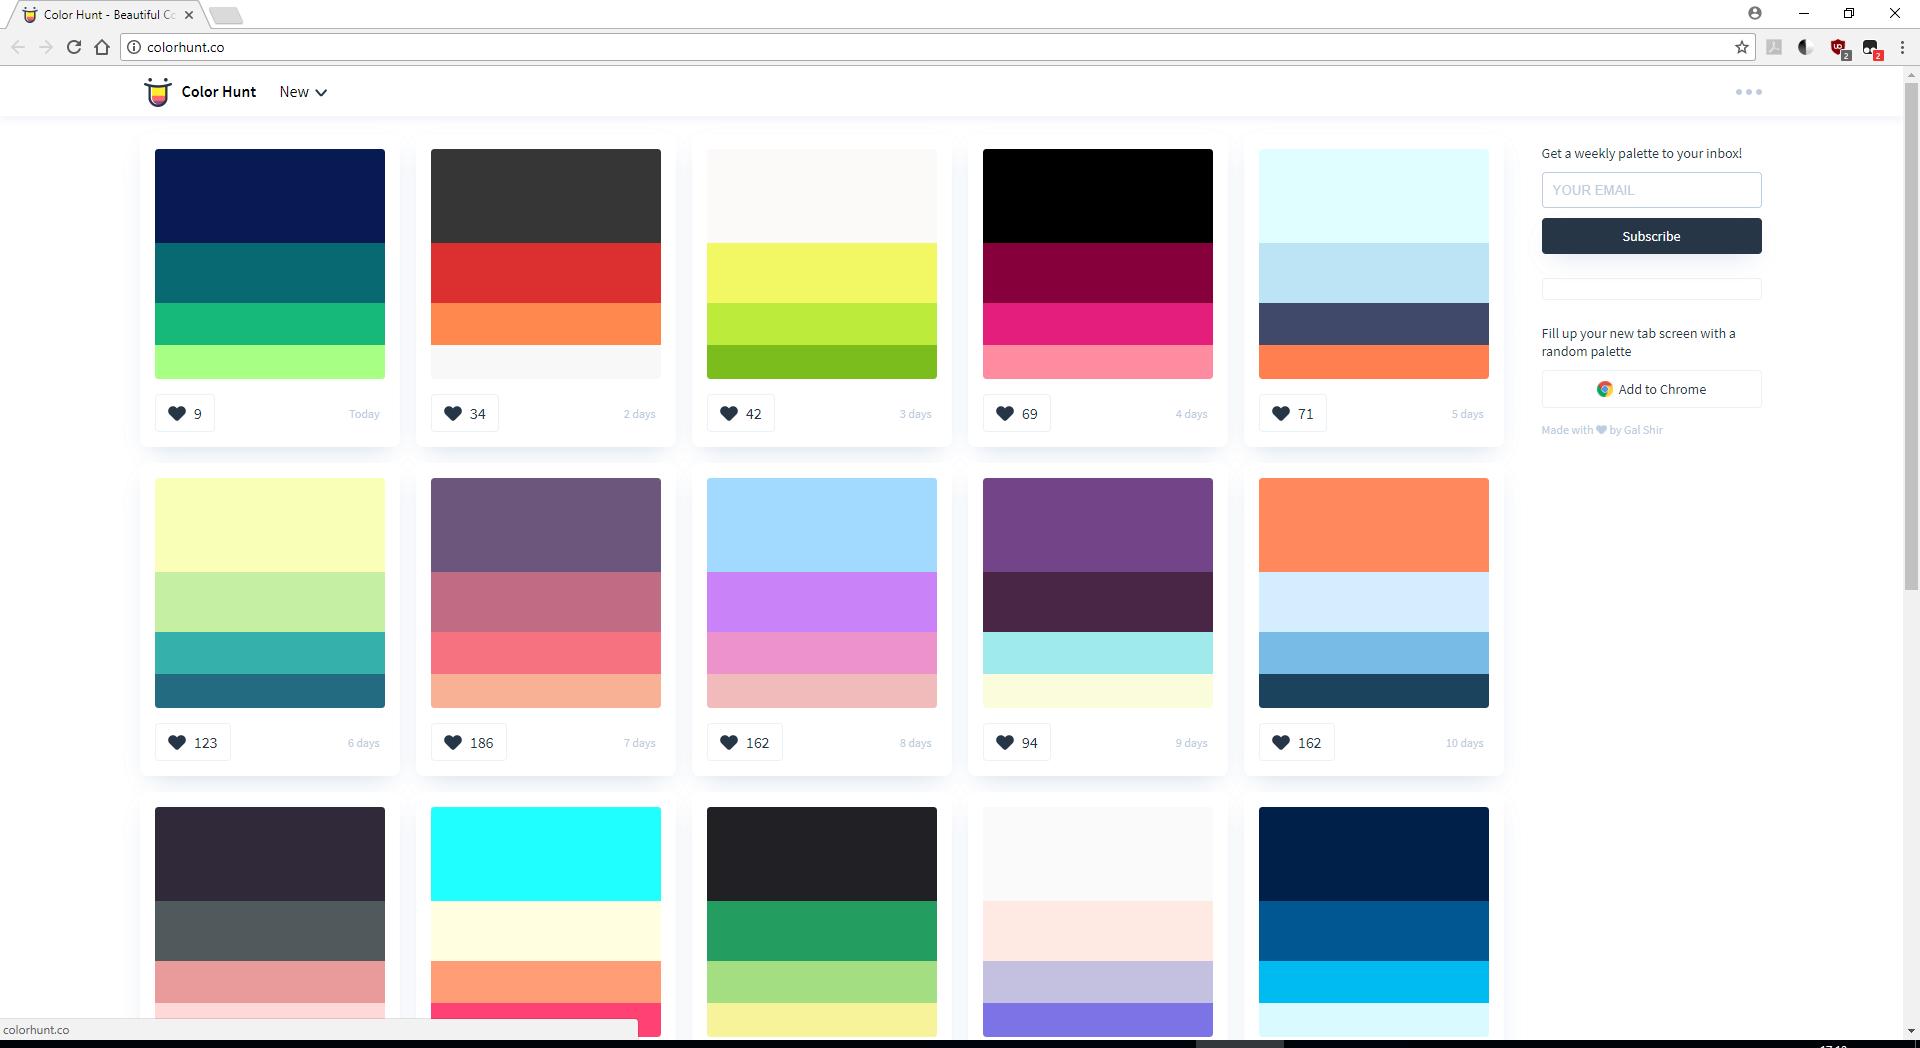 colorhunt